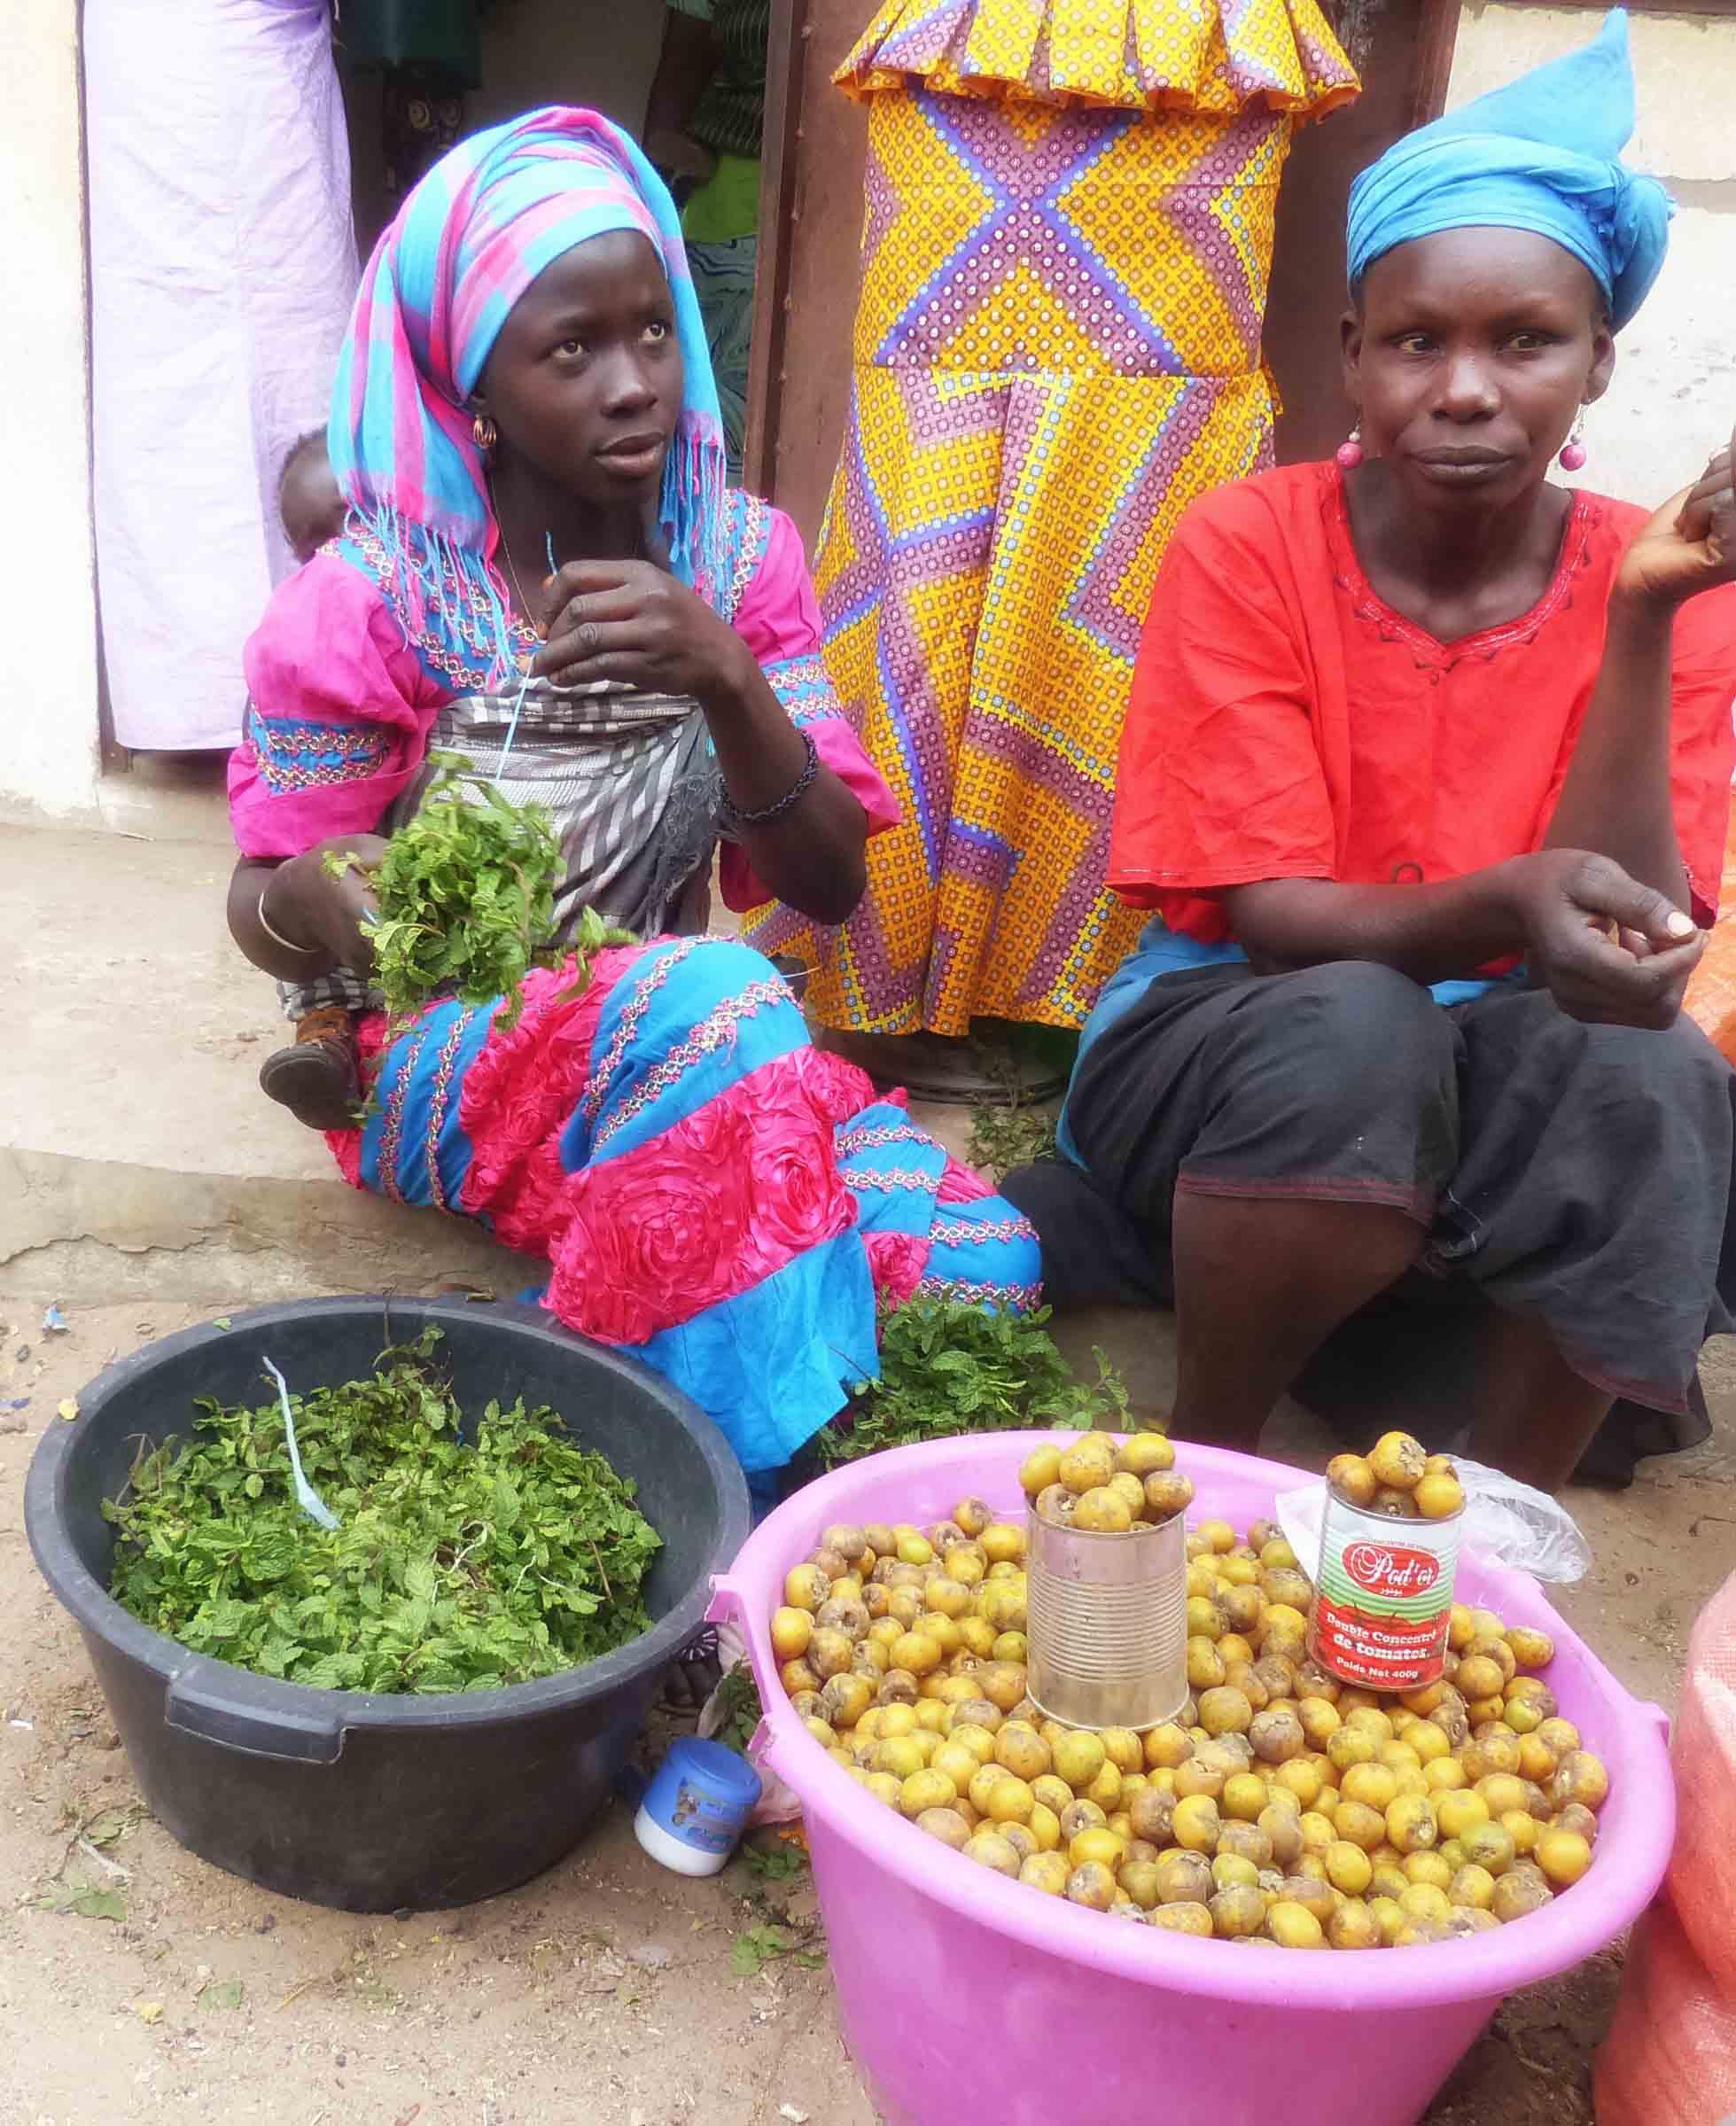 Two ladies in African dress selling vegetables